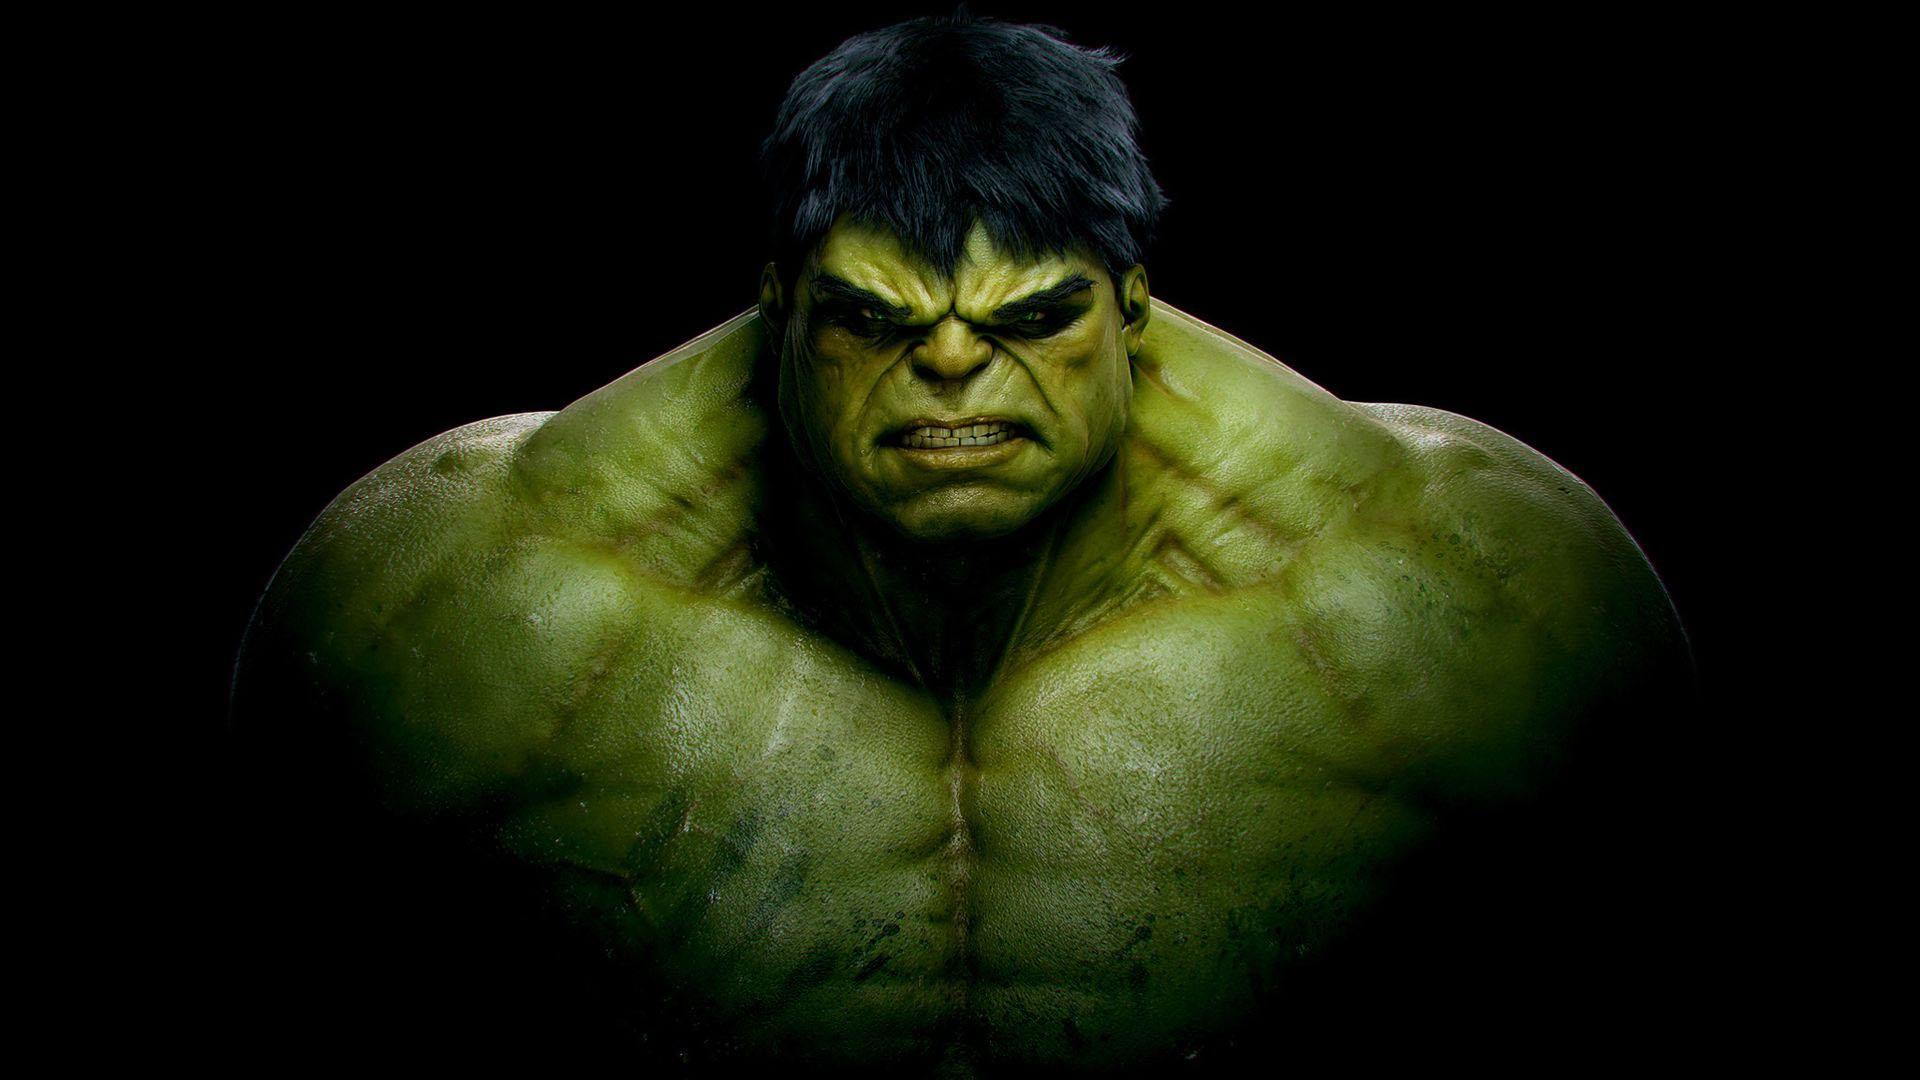 The incredible Hulk Wallpaper HD 1920 x 1080 1920x1080